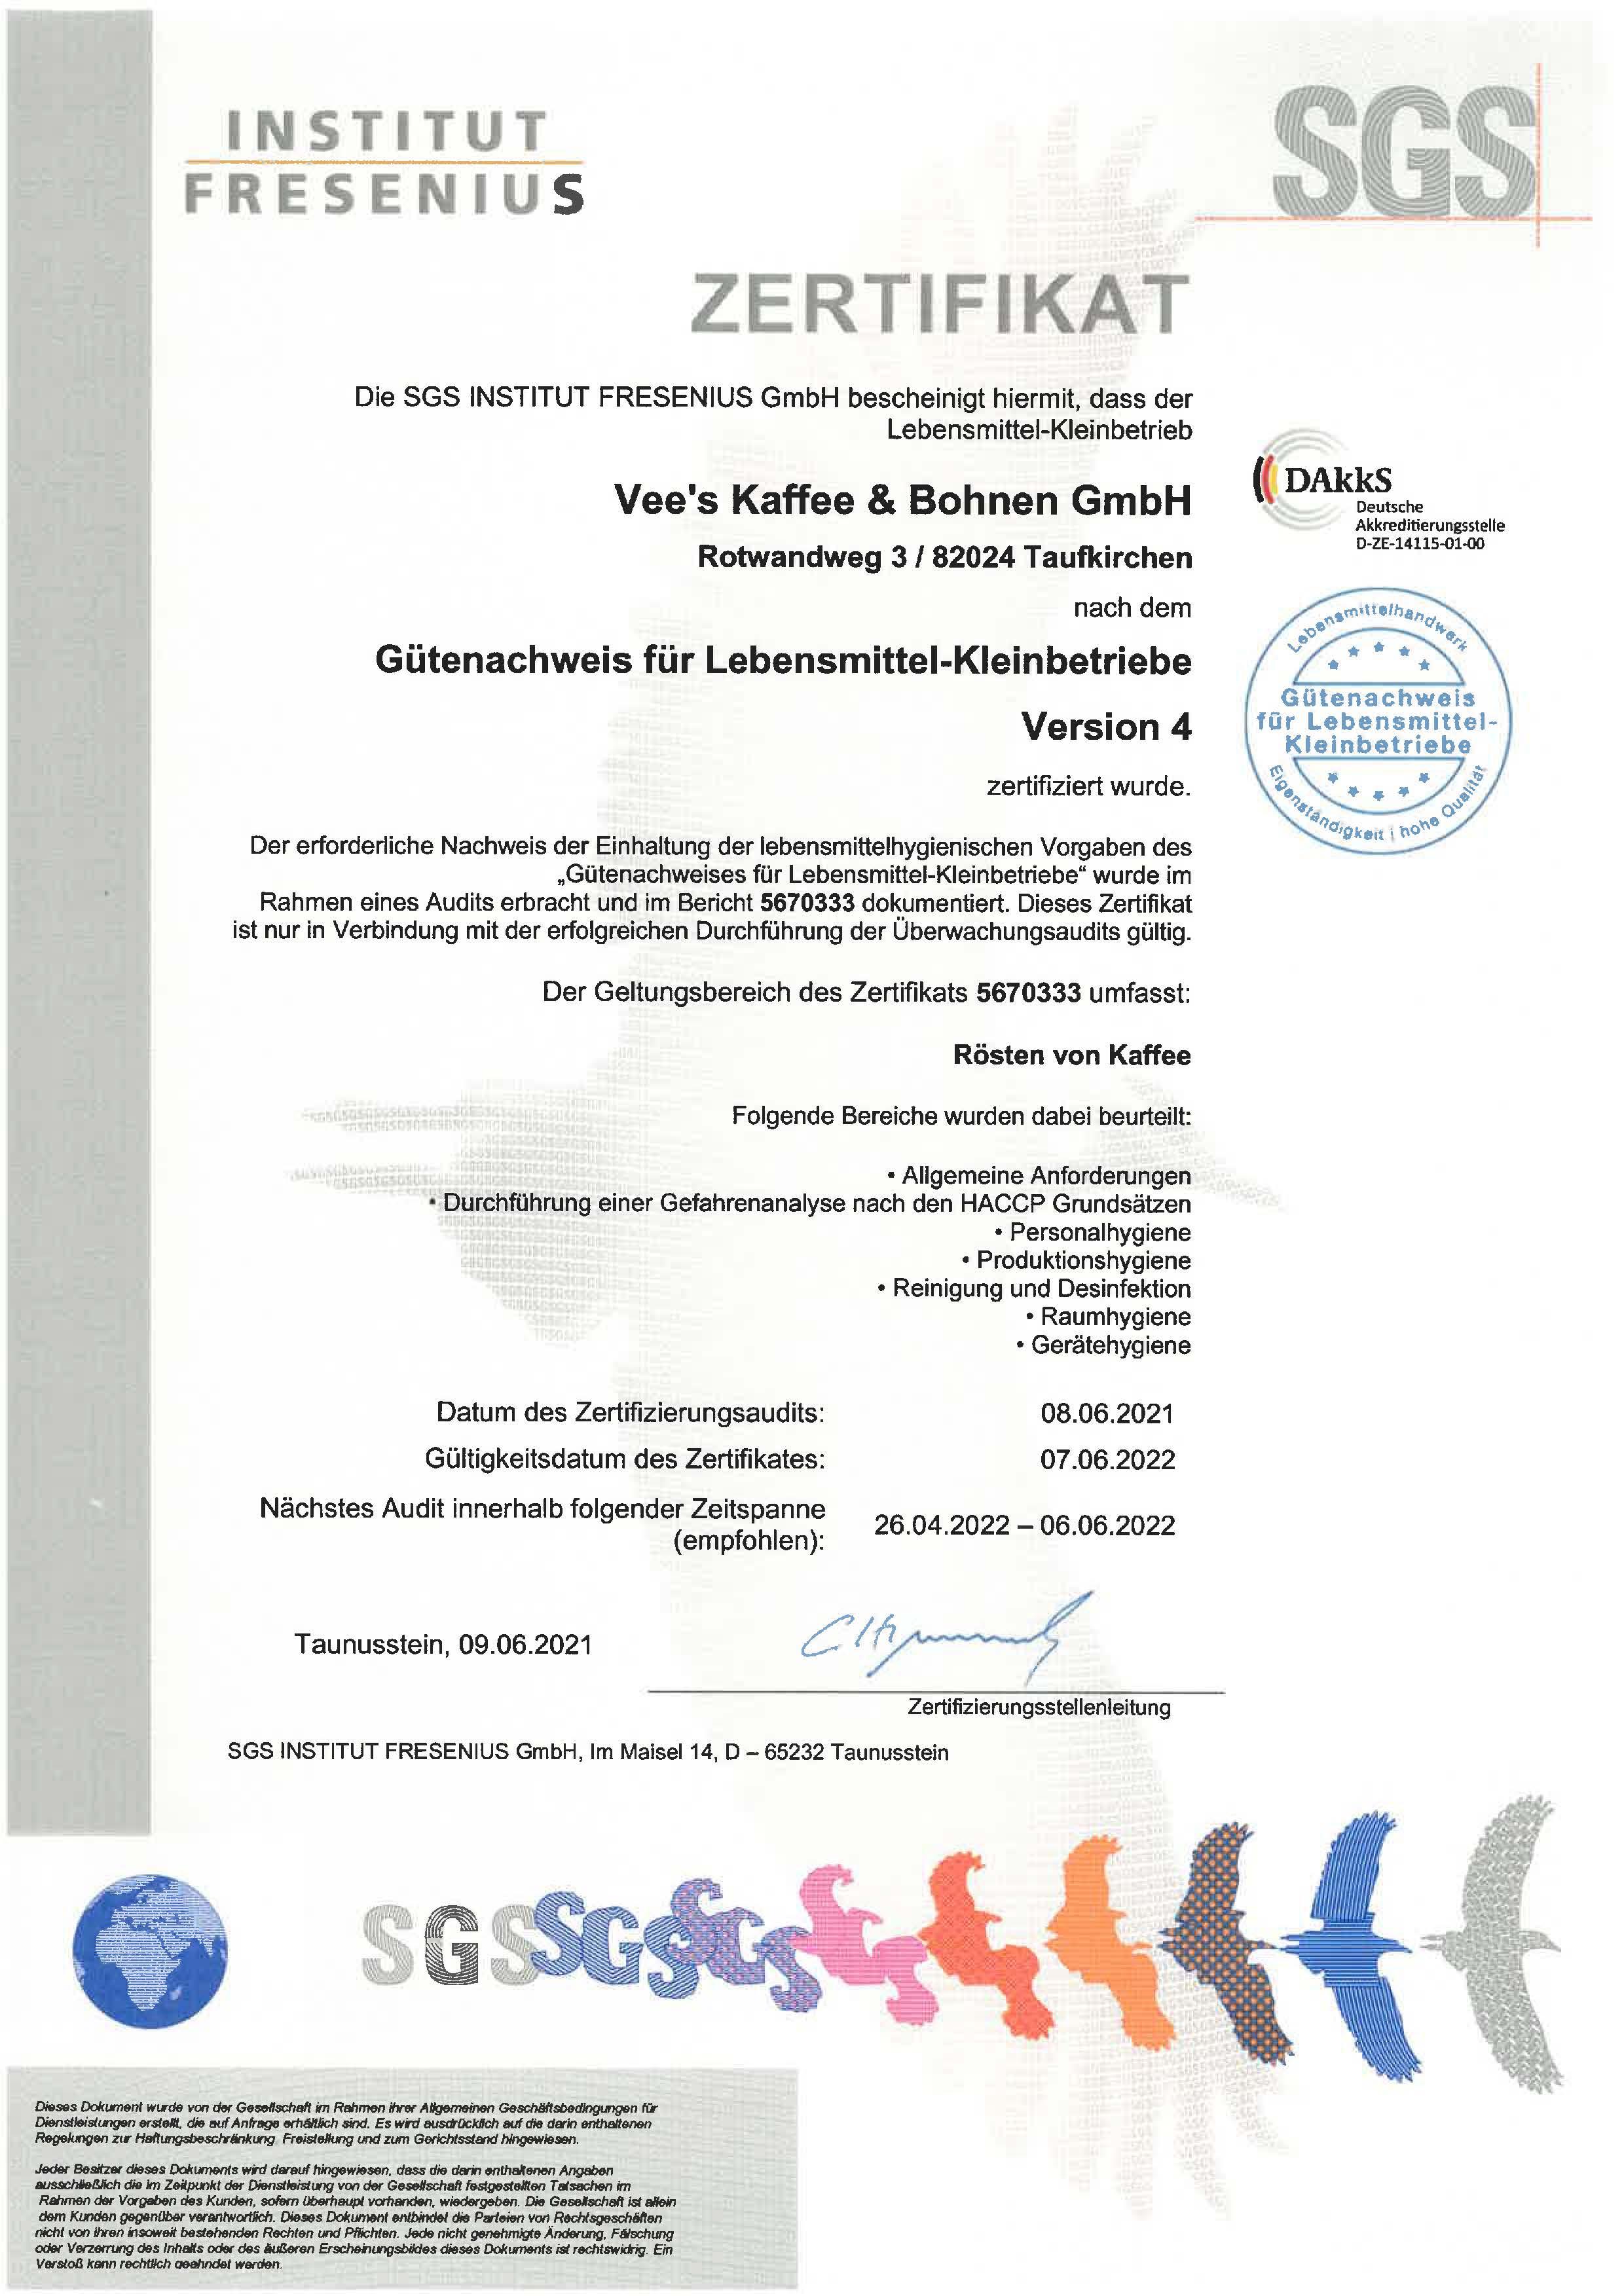 GLK_Zertifikat_Vees%20Kaffee%20&%20Bohnen%20GmbH_2021_DE.jpg